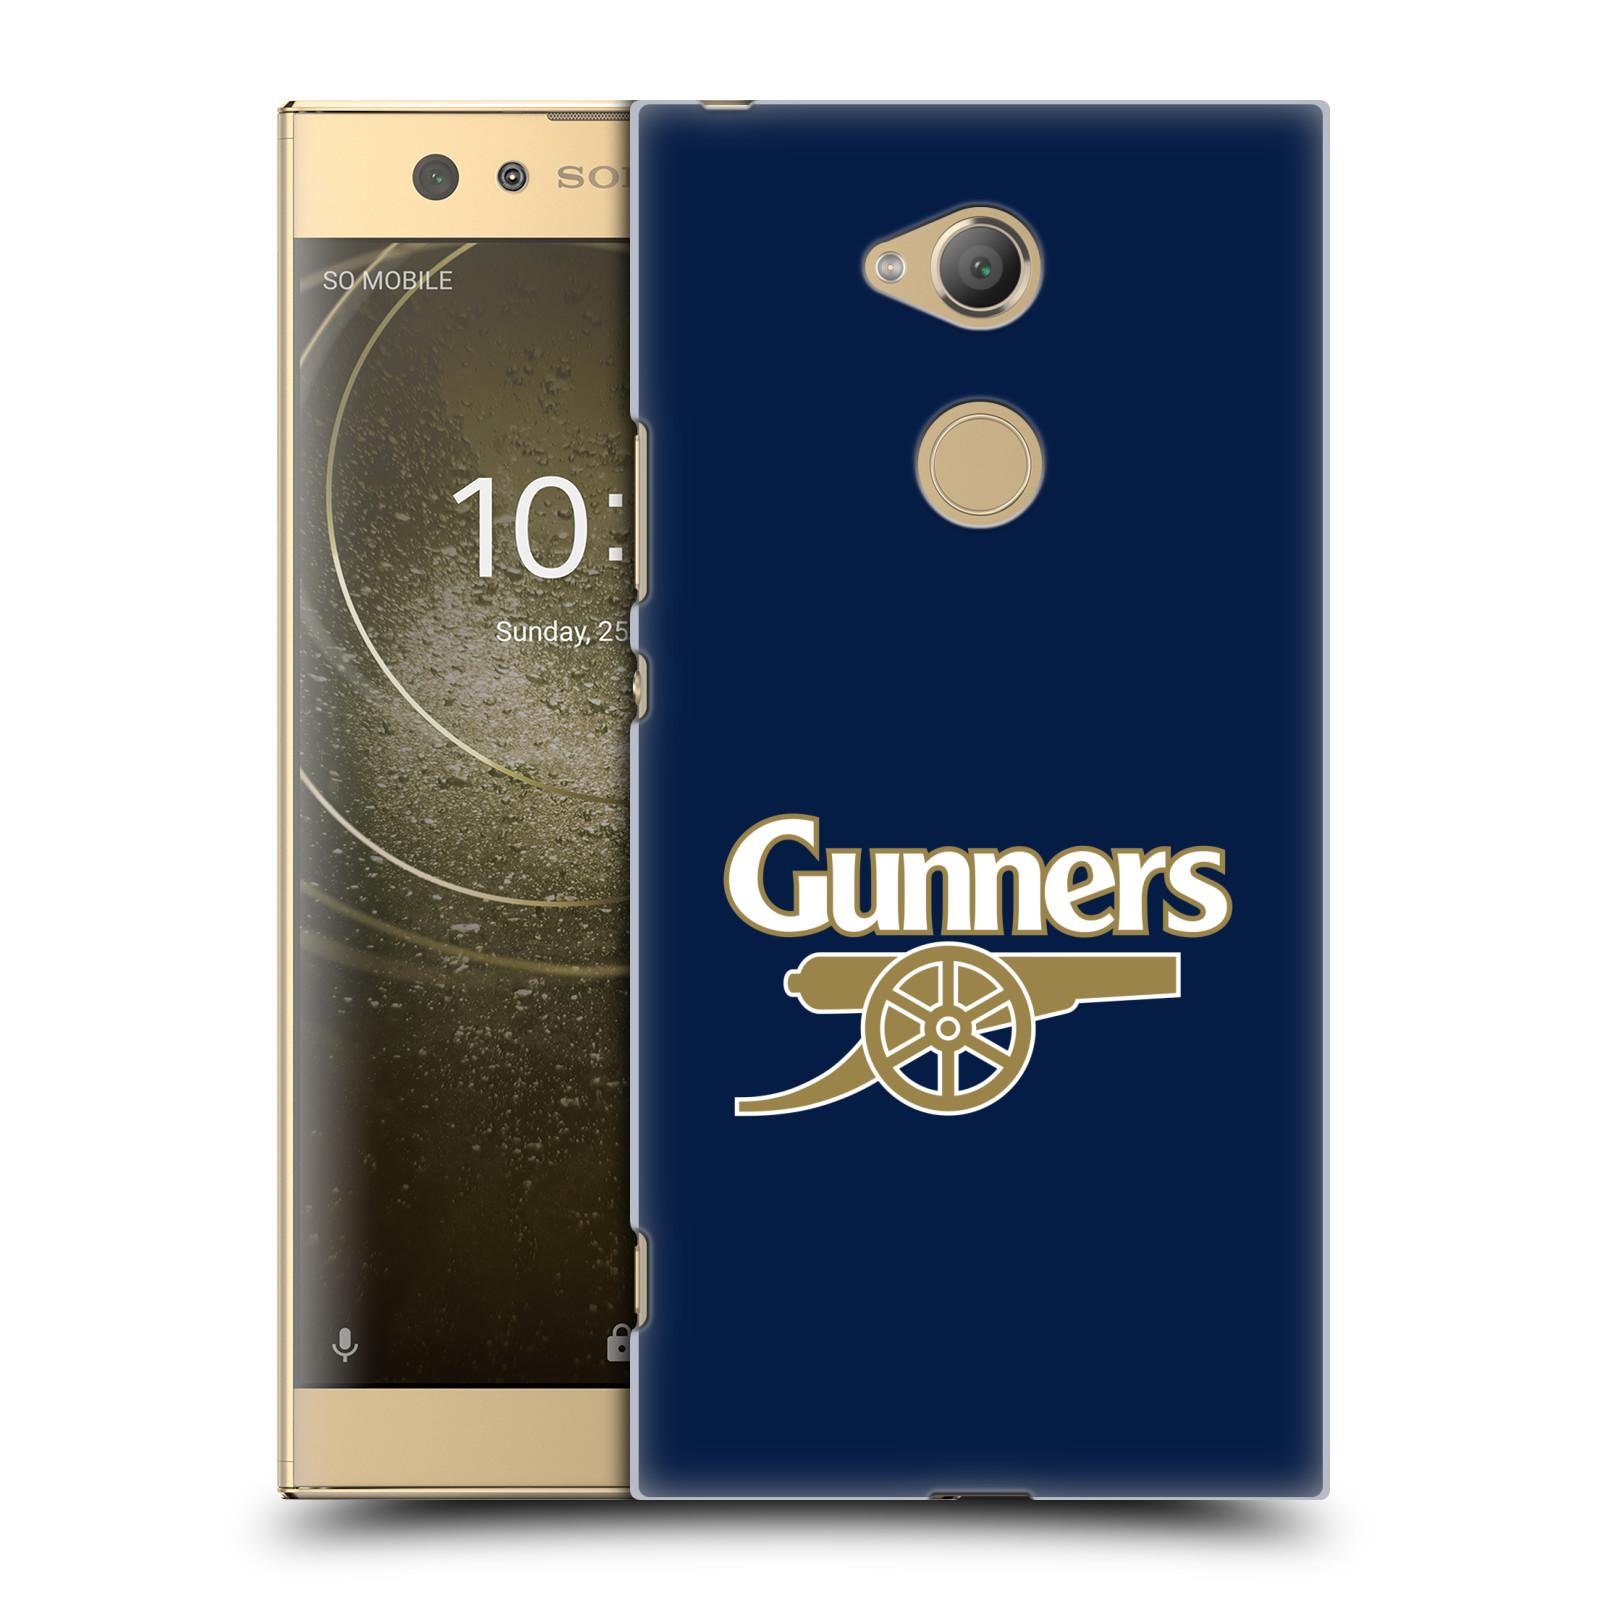 Plastové pouzdro na mobil Sony Xperia XA2 Ultra - Head Case - Arsenal FC - Gunners